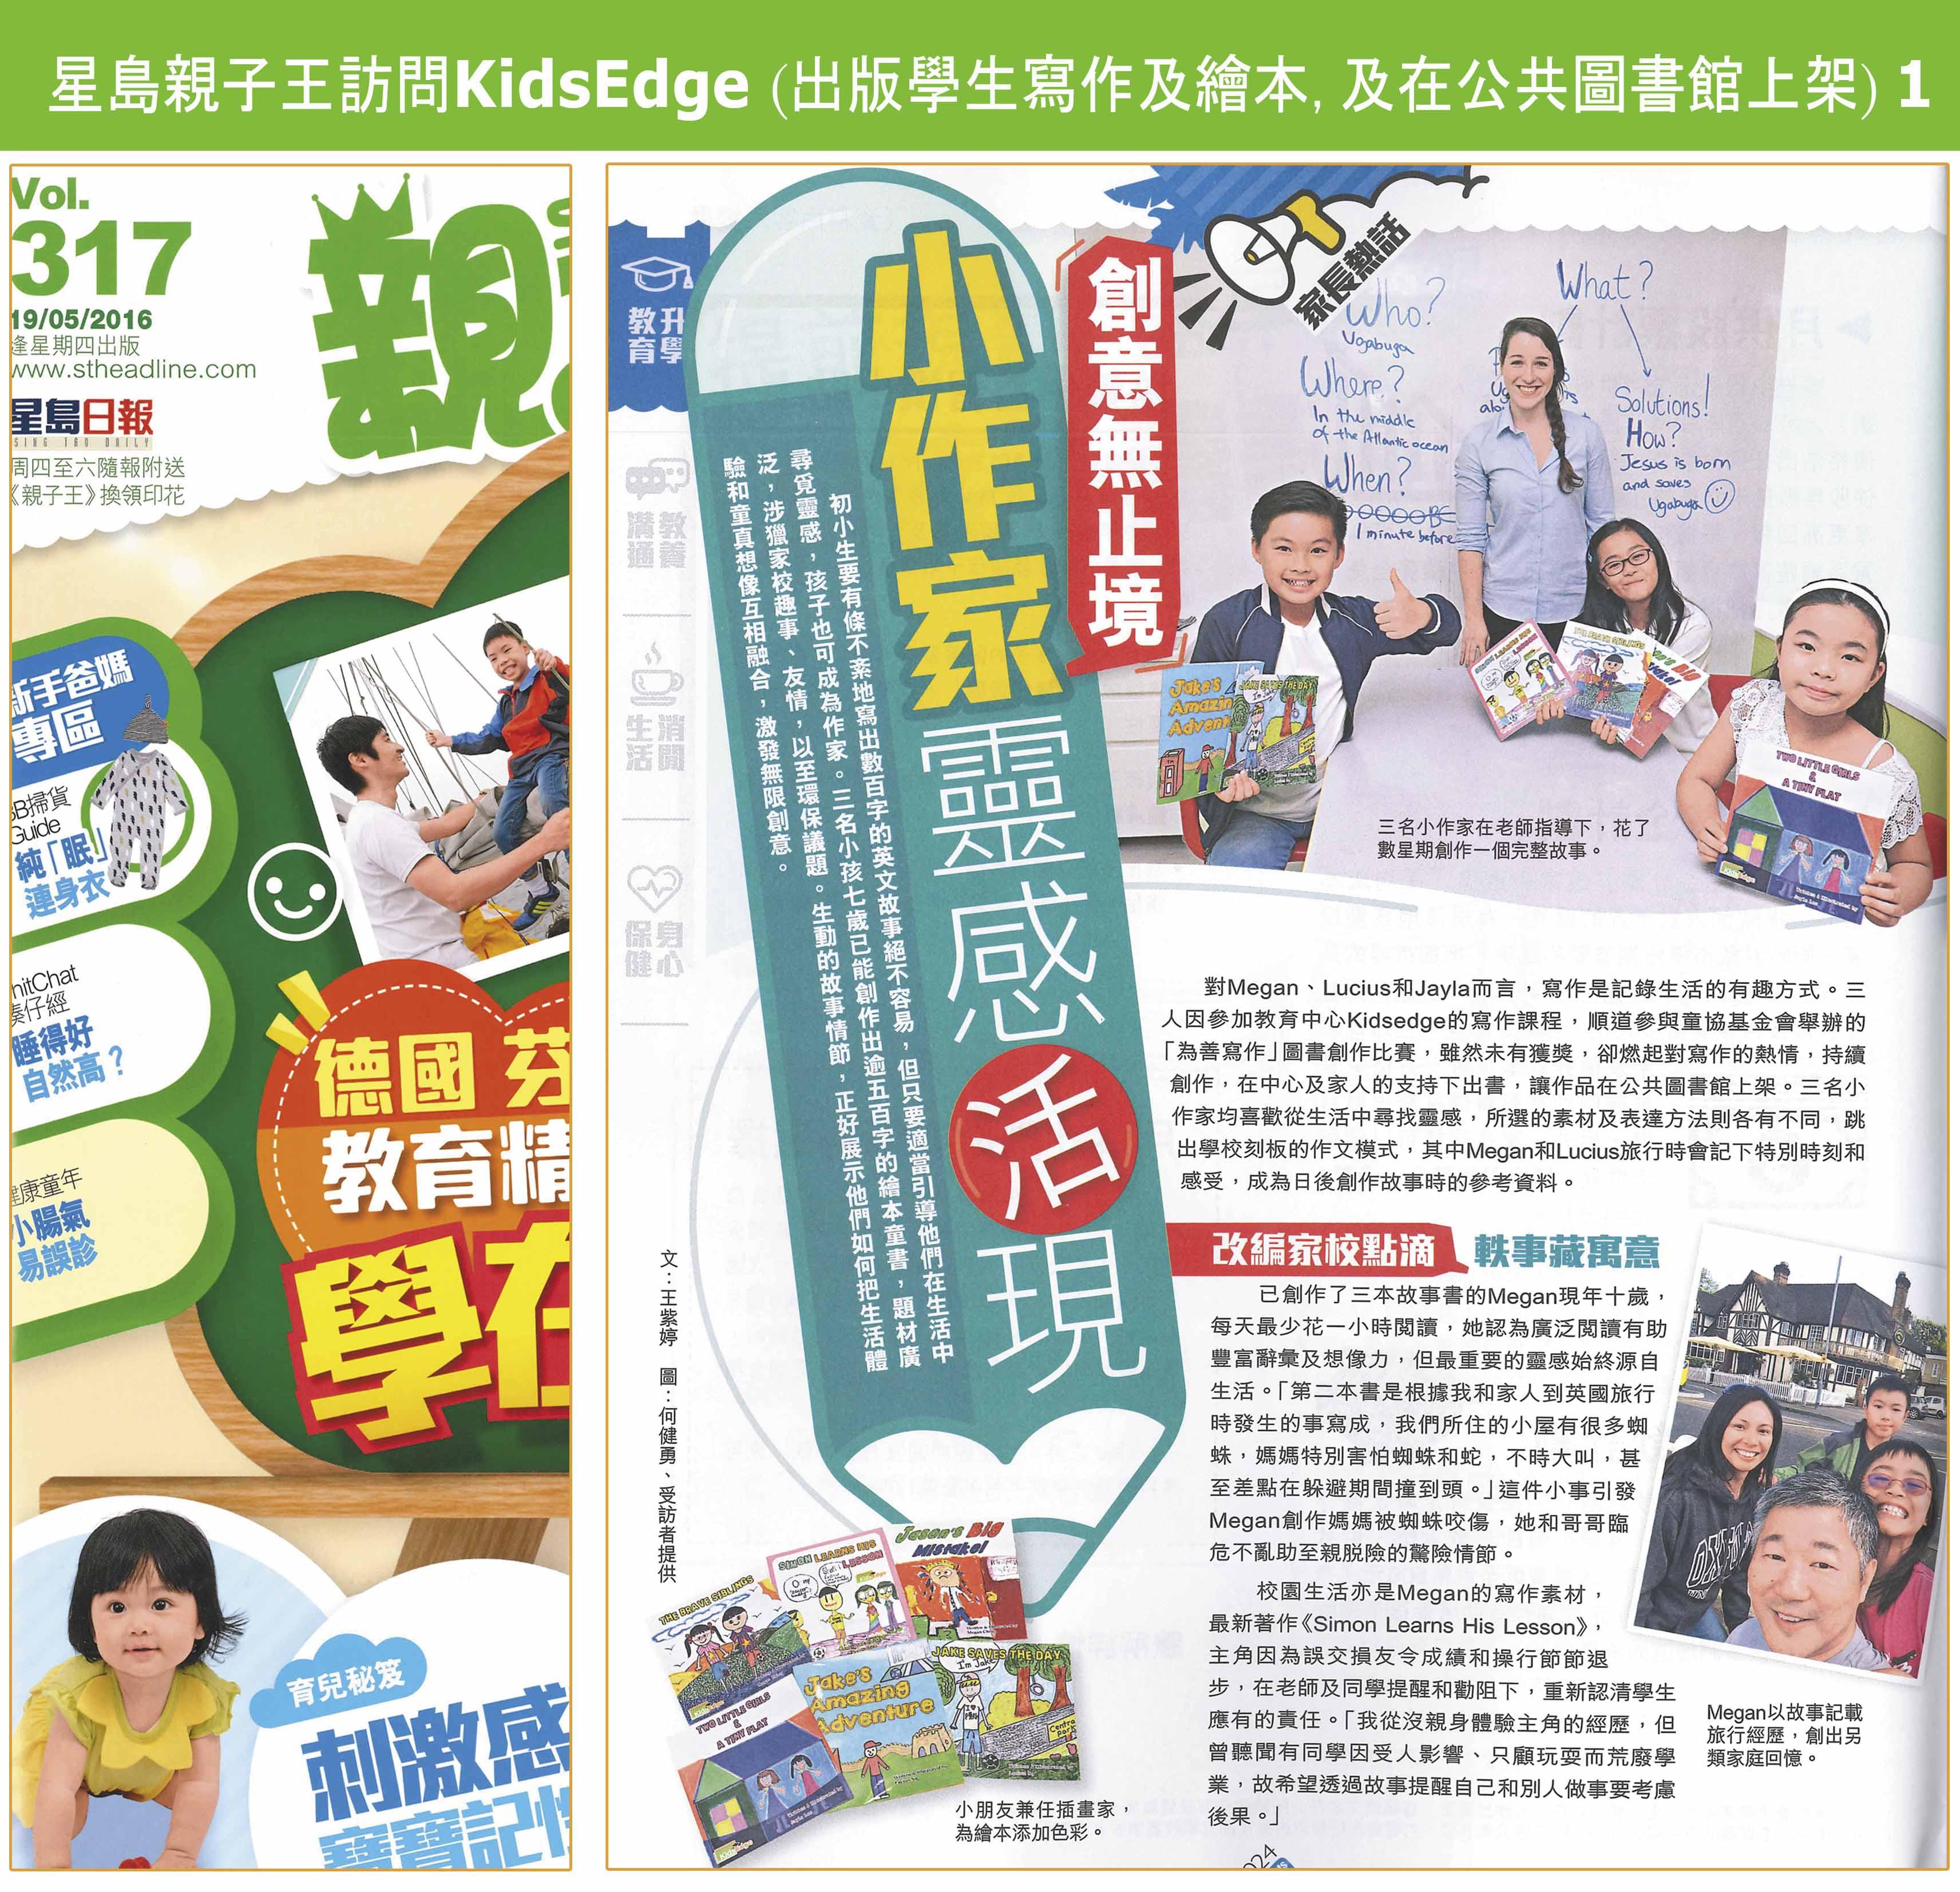 May 2016 - Singtao Interviewed KidsEdge Min1